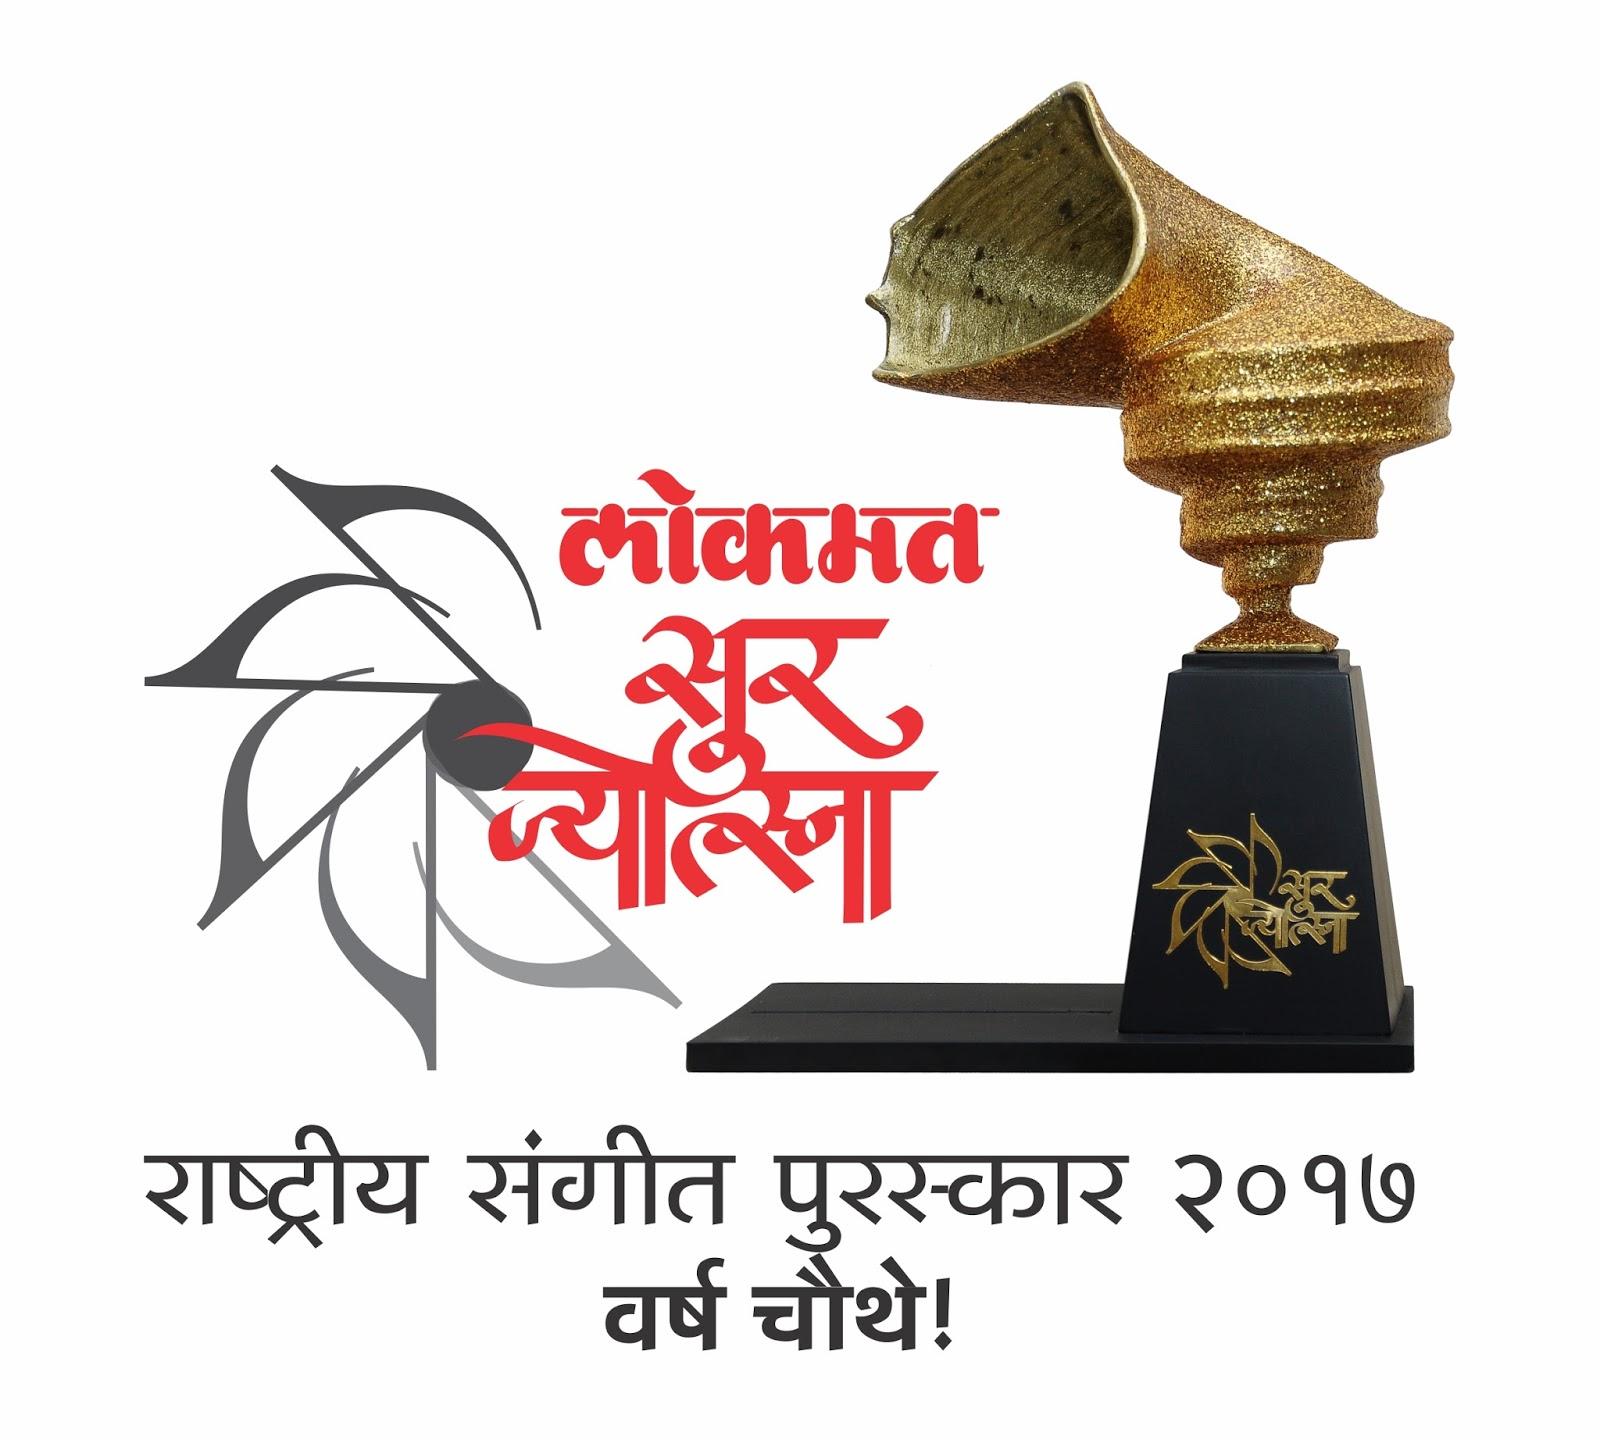 Roop Bhullar 31 March New Song: Lokmat SurJyotsna Award Is A Platform For Aspiring Singers